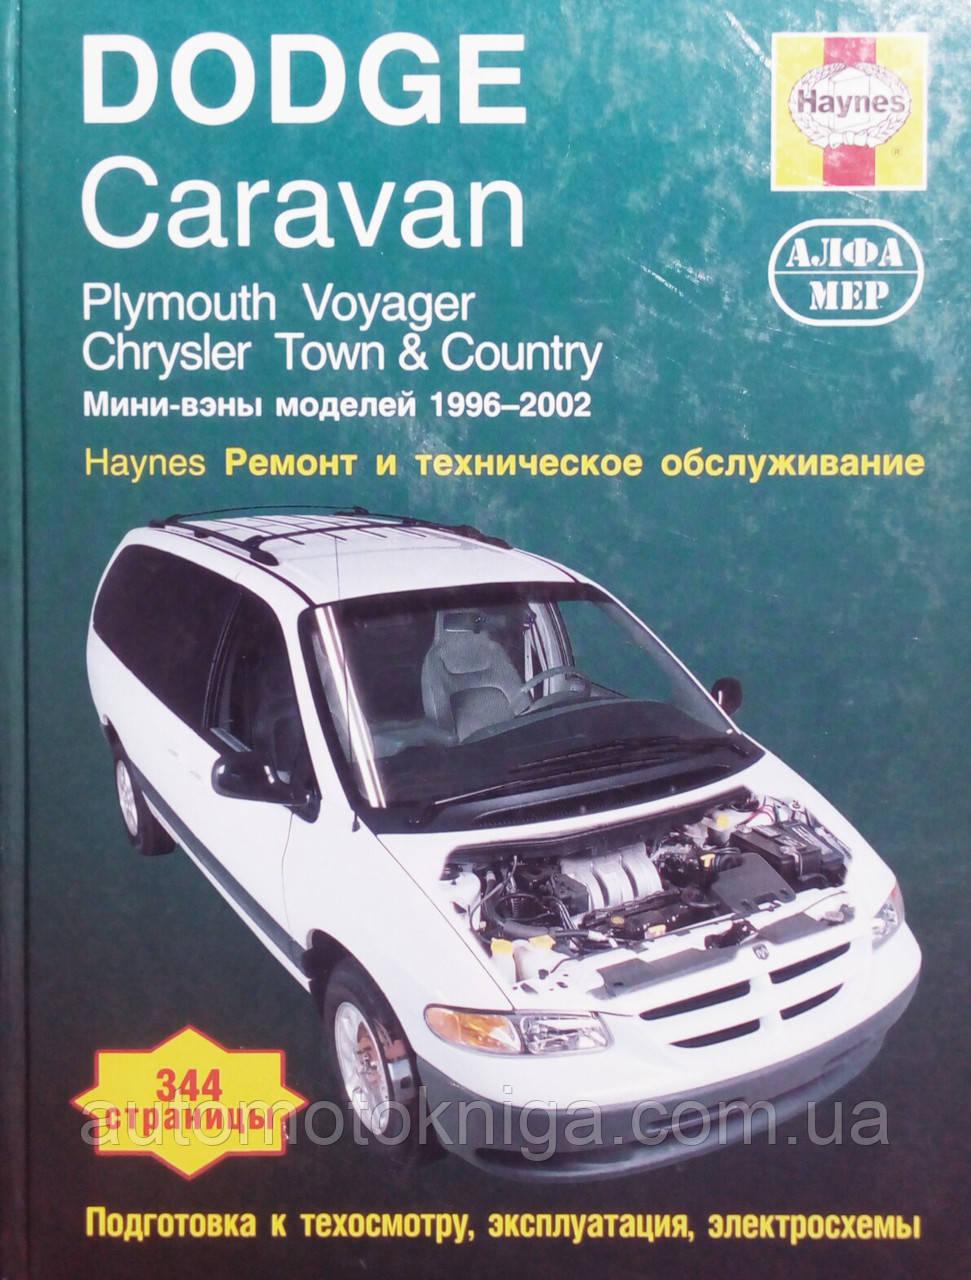 DODGE CARAVAN  PLYMOUTH VOYAGER  CHRYSLER TOWN & COUNTRY   Модели 1996-2002 гг.   Haynes Ремонт